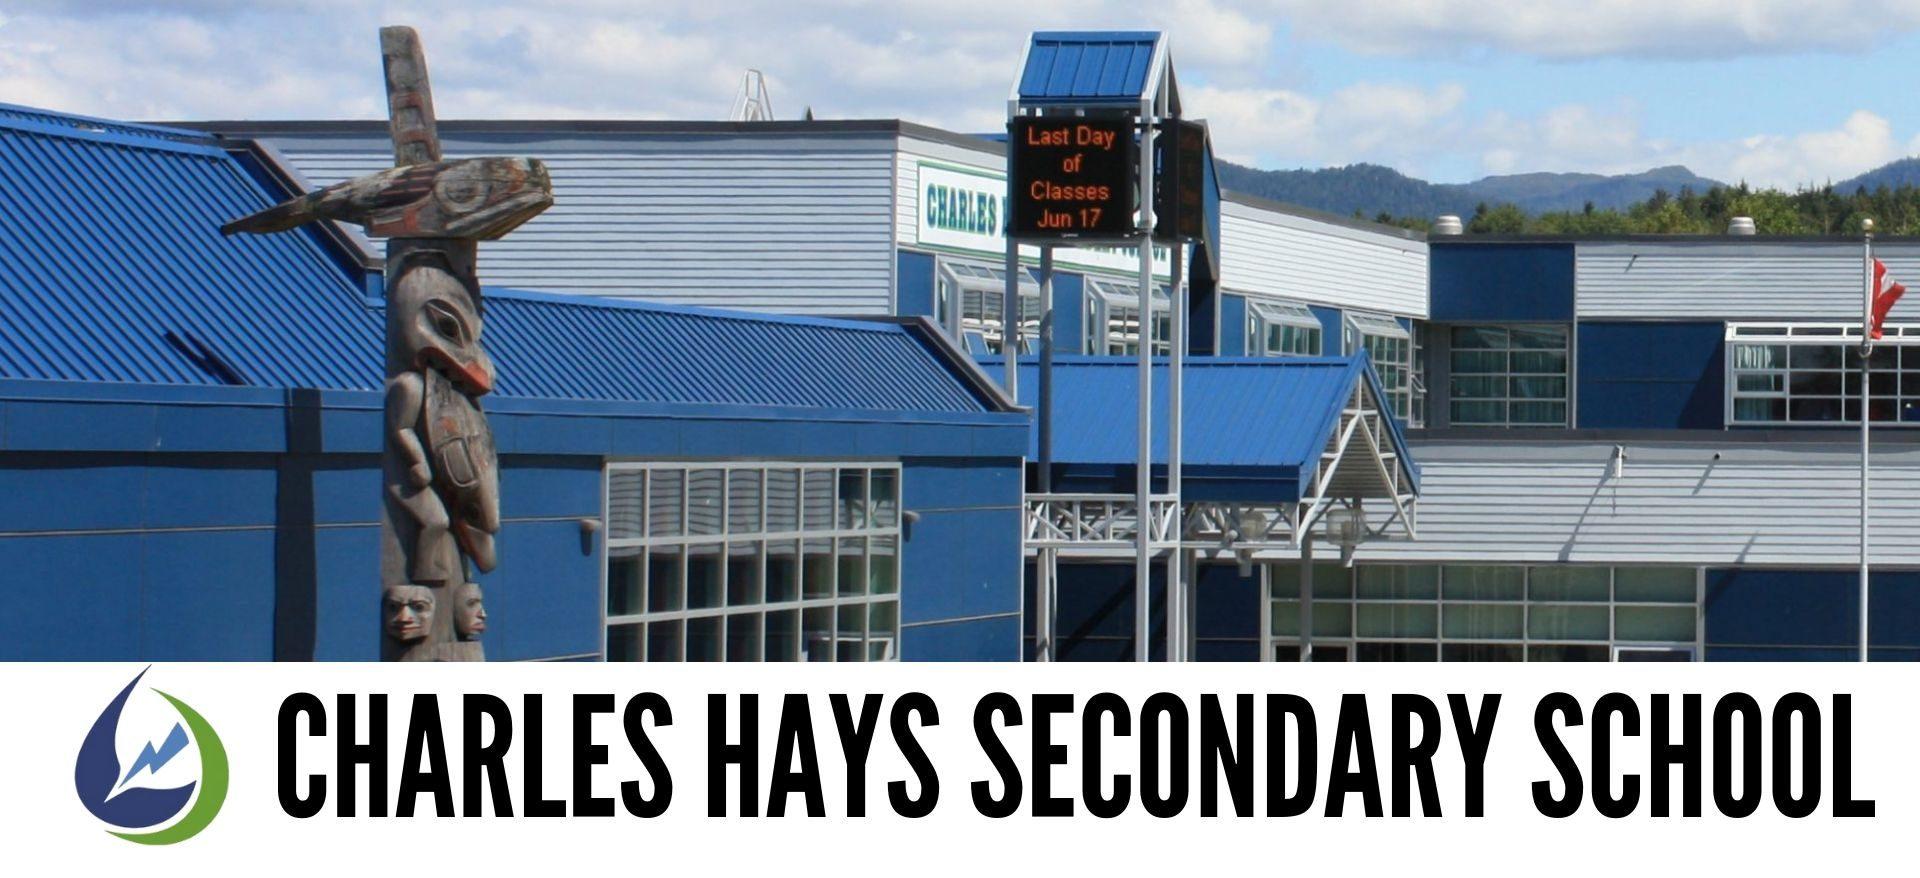 Charles Hays Secondary